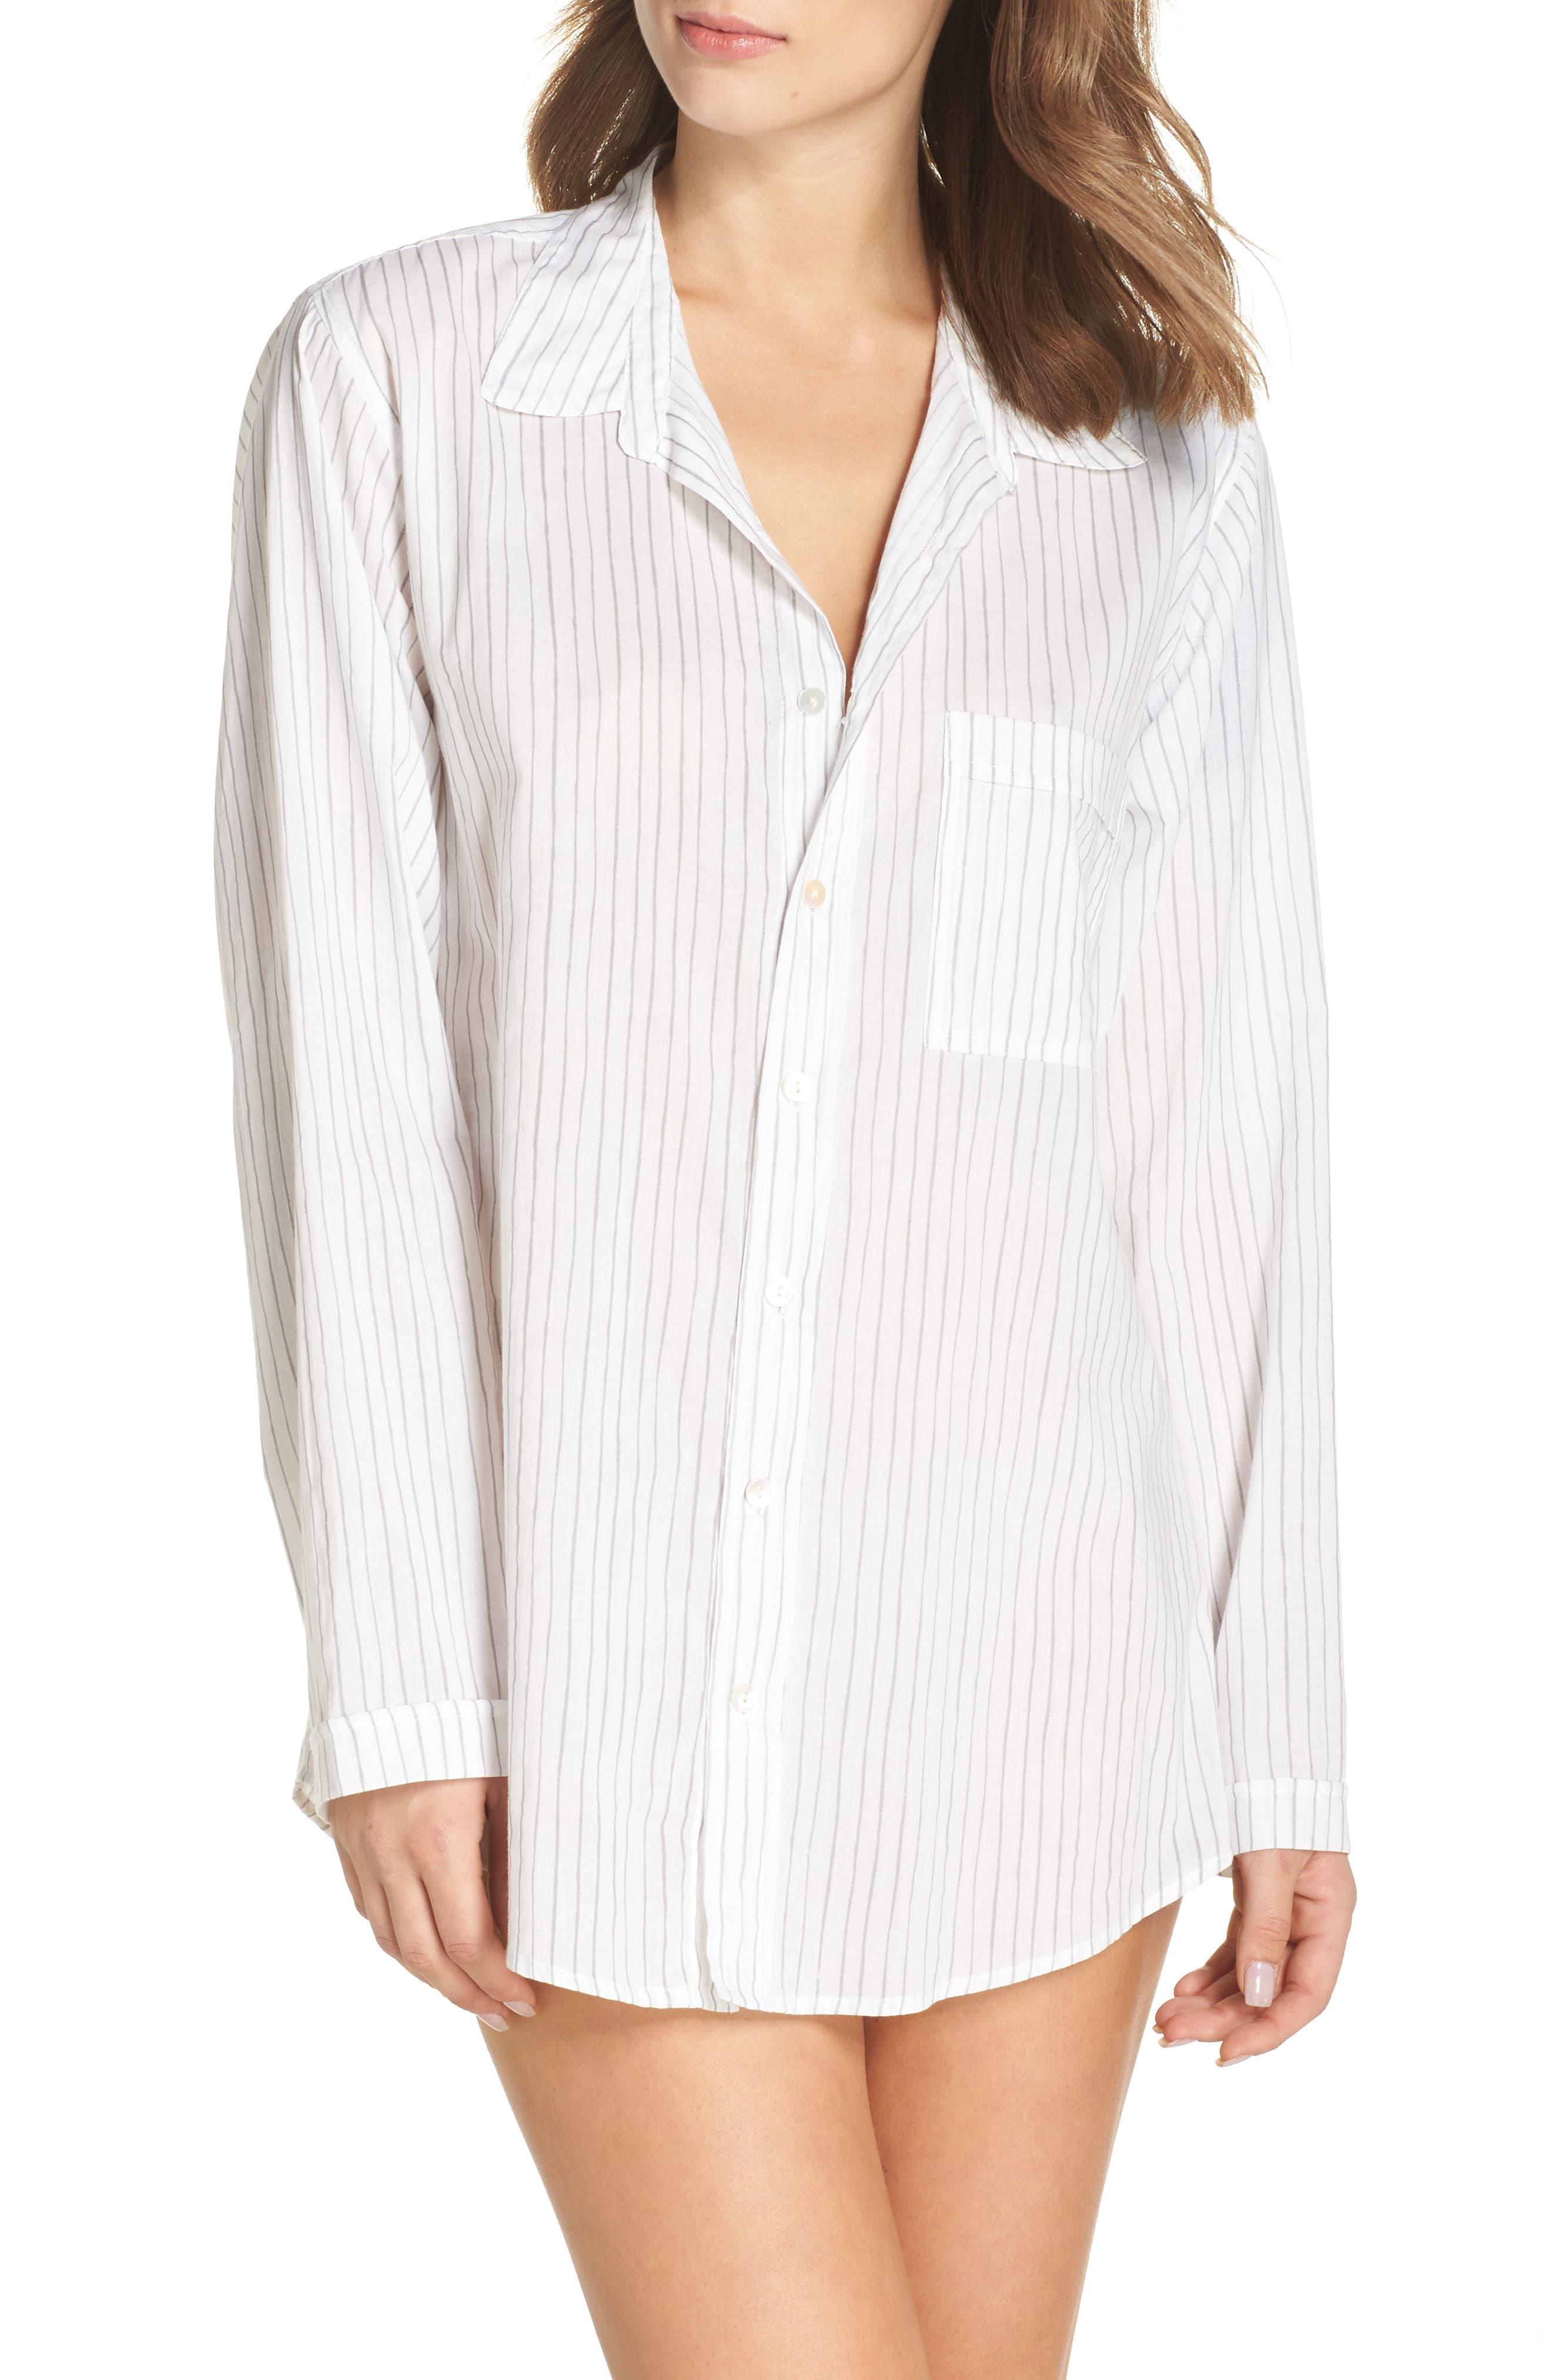 Main Image - Pour Les Femmes Pinstripe Boyfriend Sleep Shirt